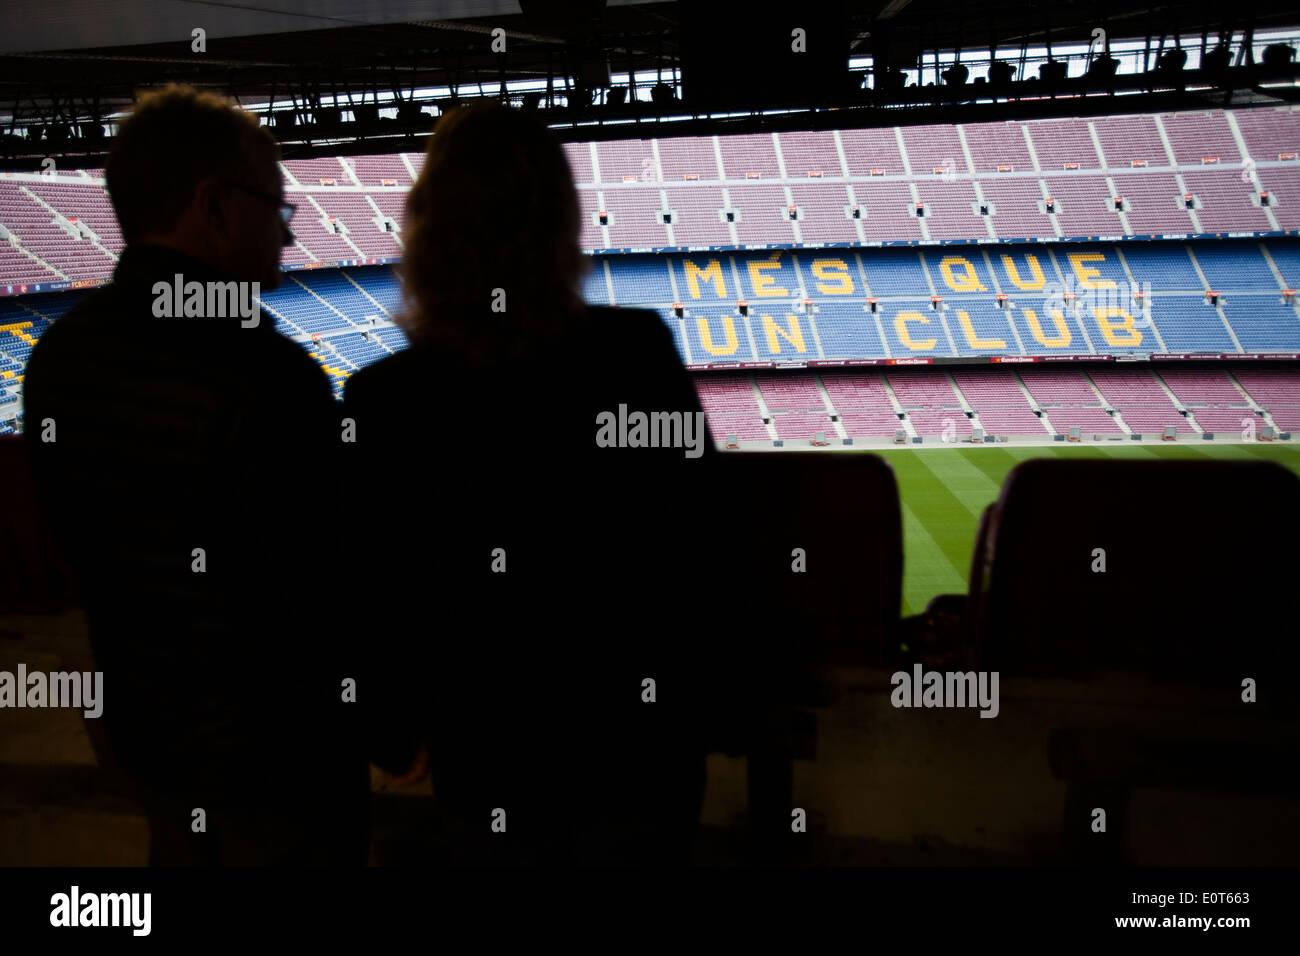 Football club Barcelona stadium - Stock Image